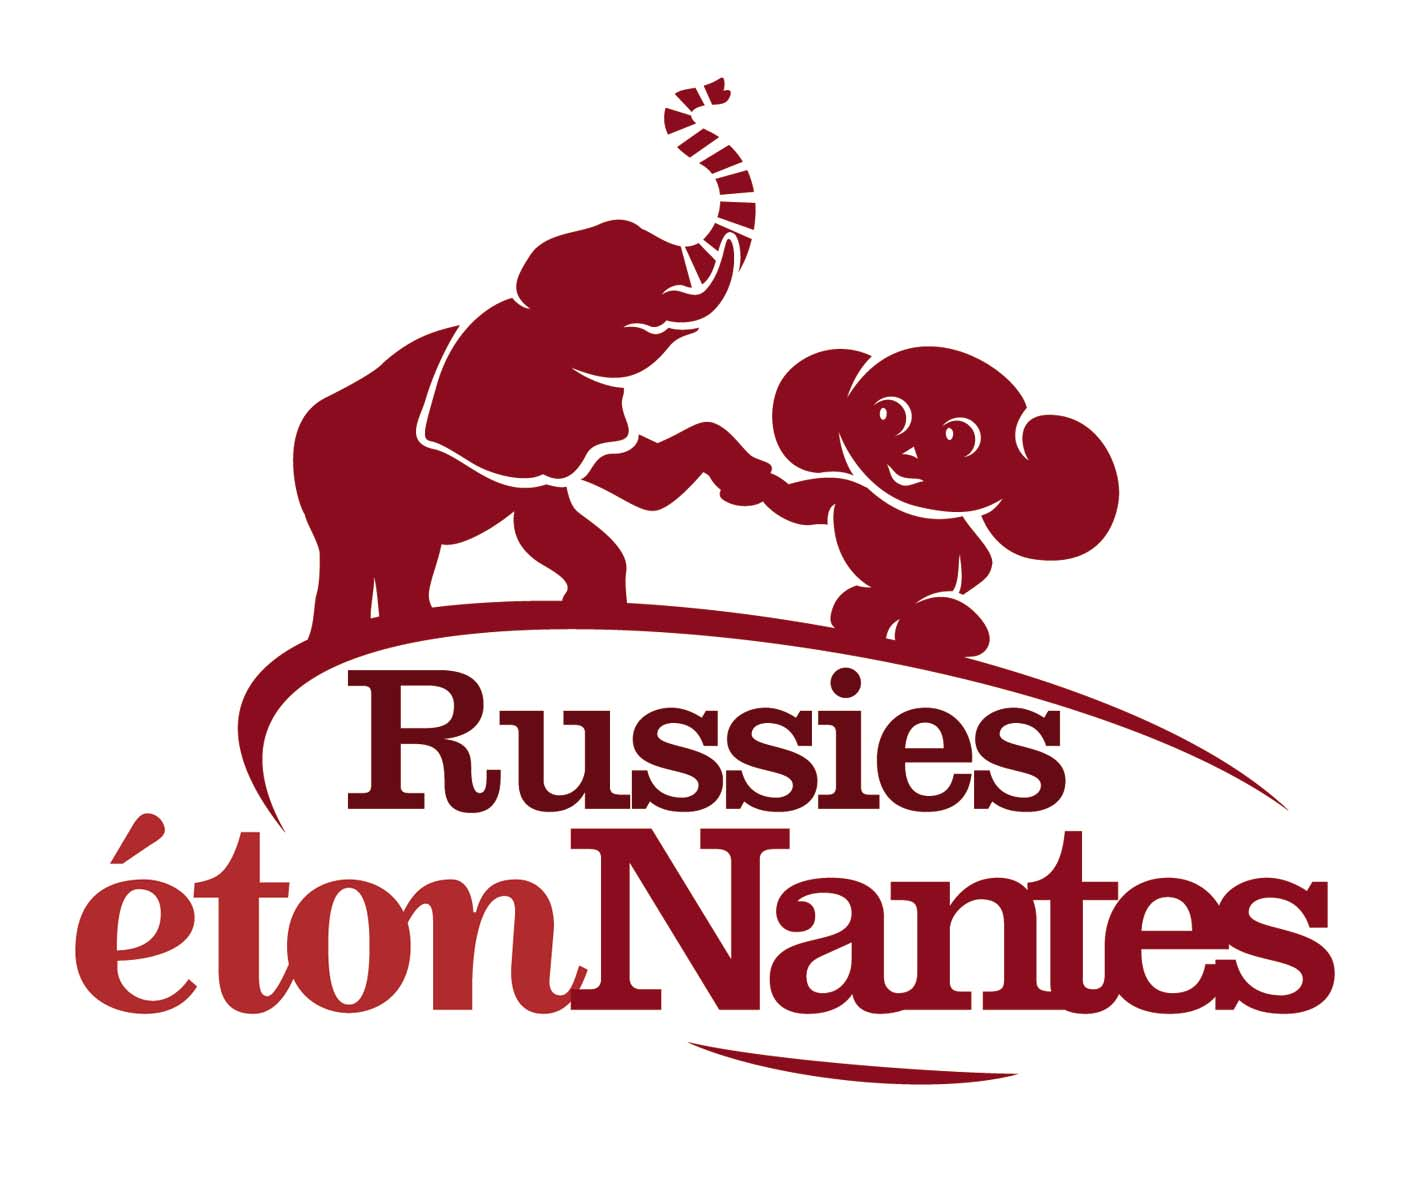 logo Russies EtonNantes